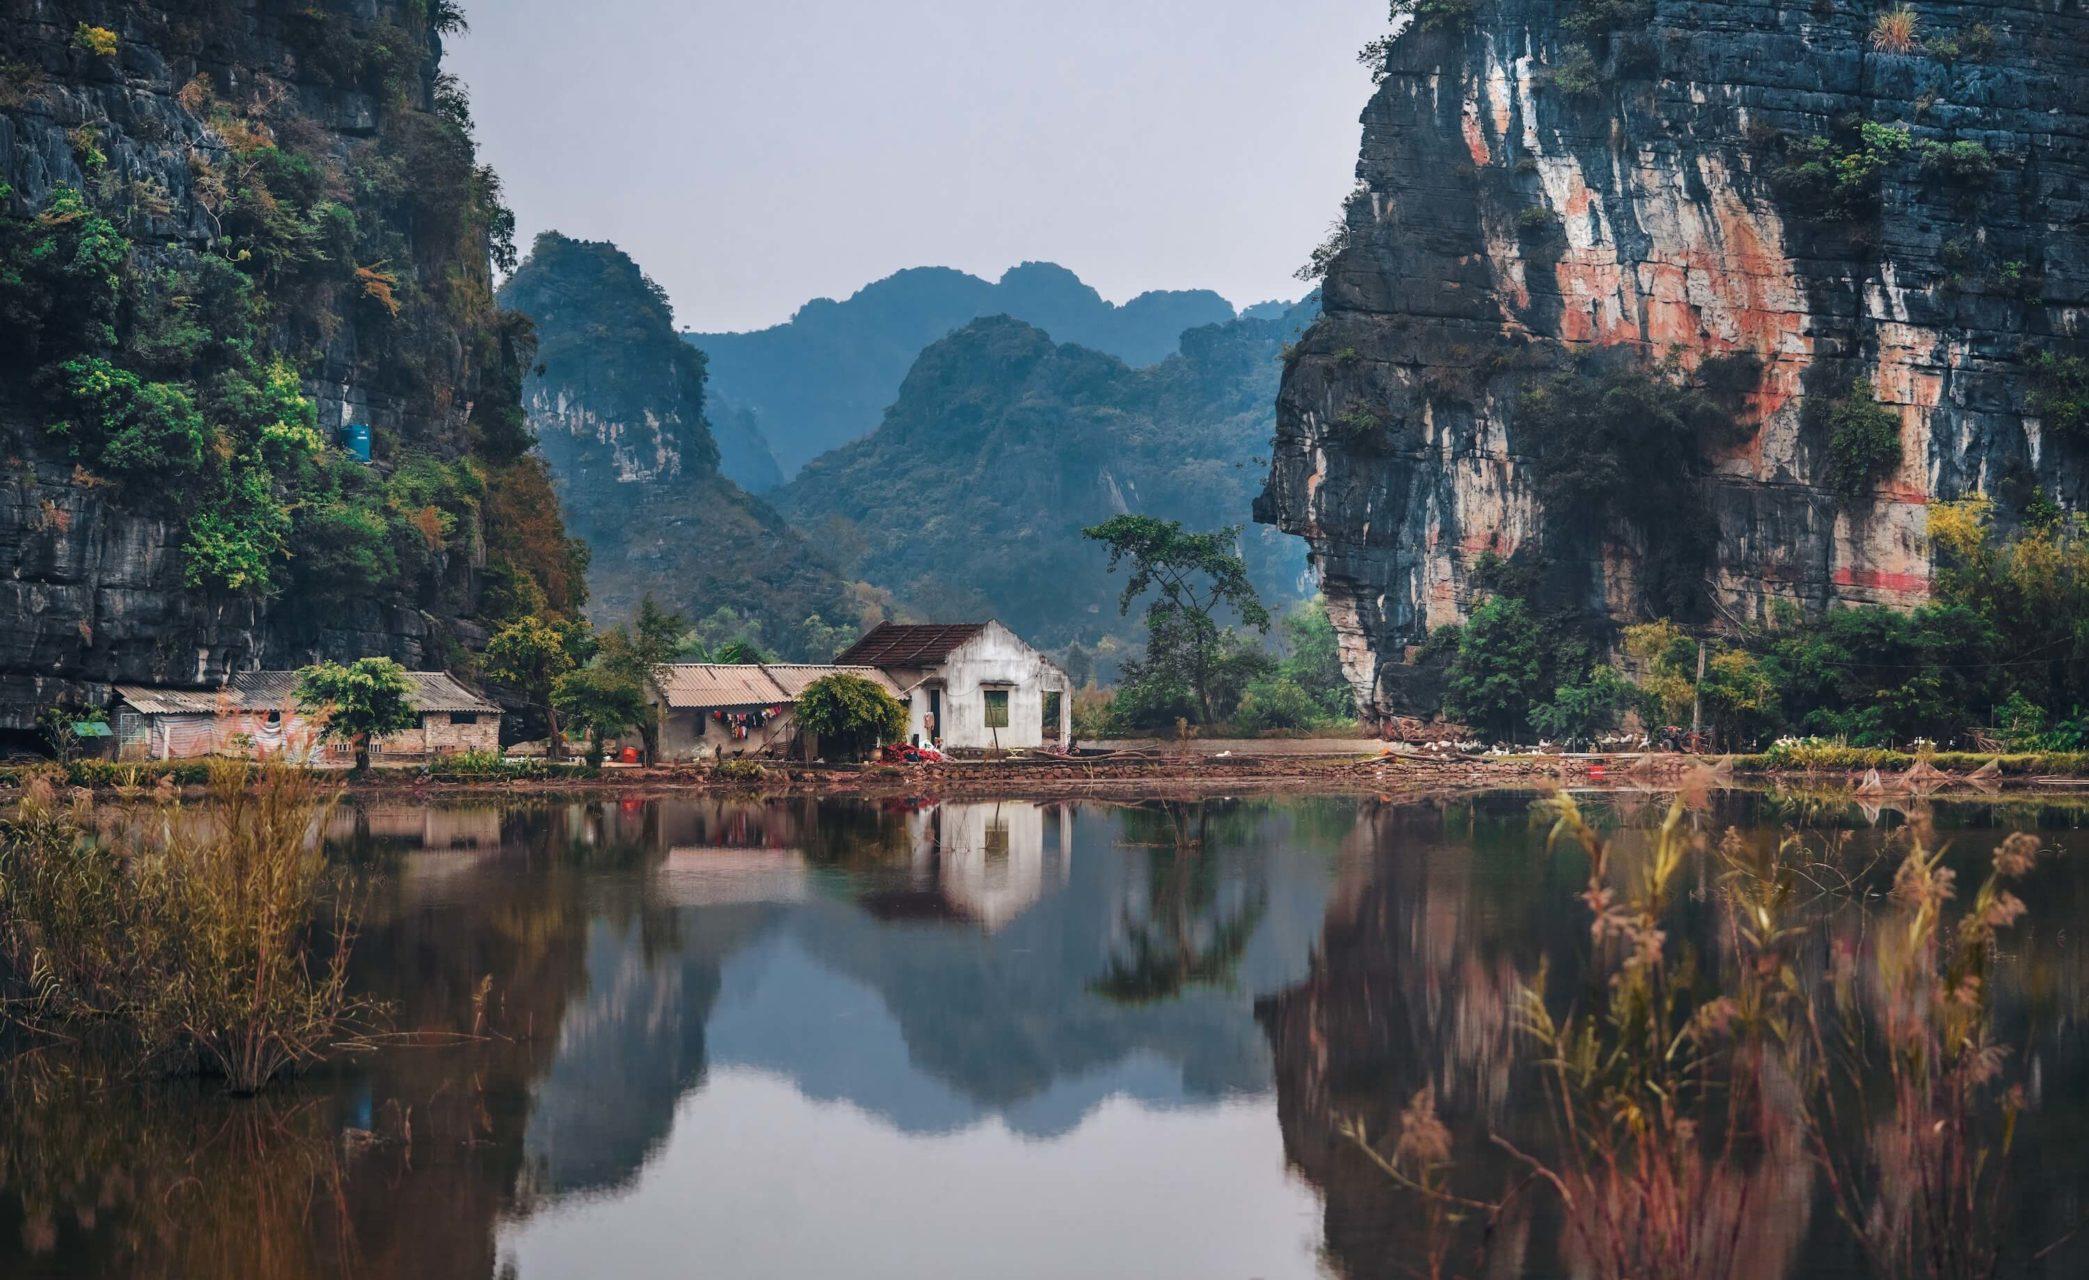 View of Lake in Vietnam